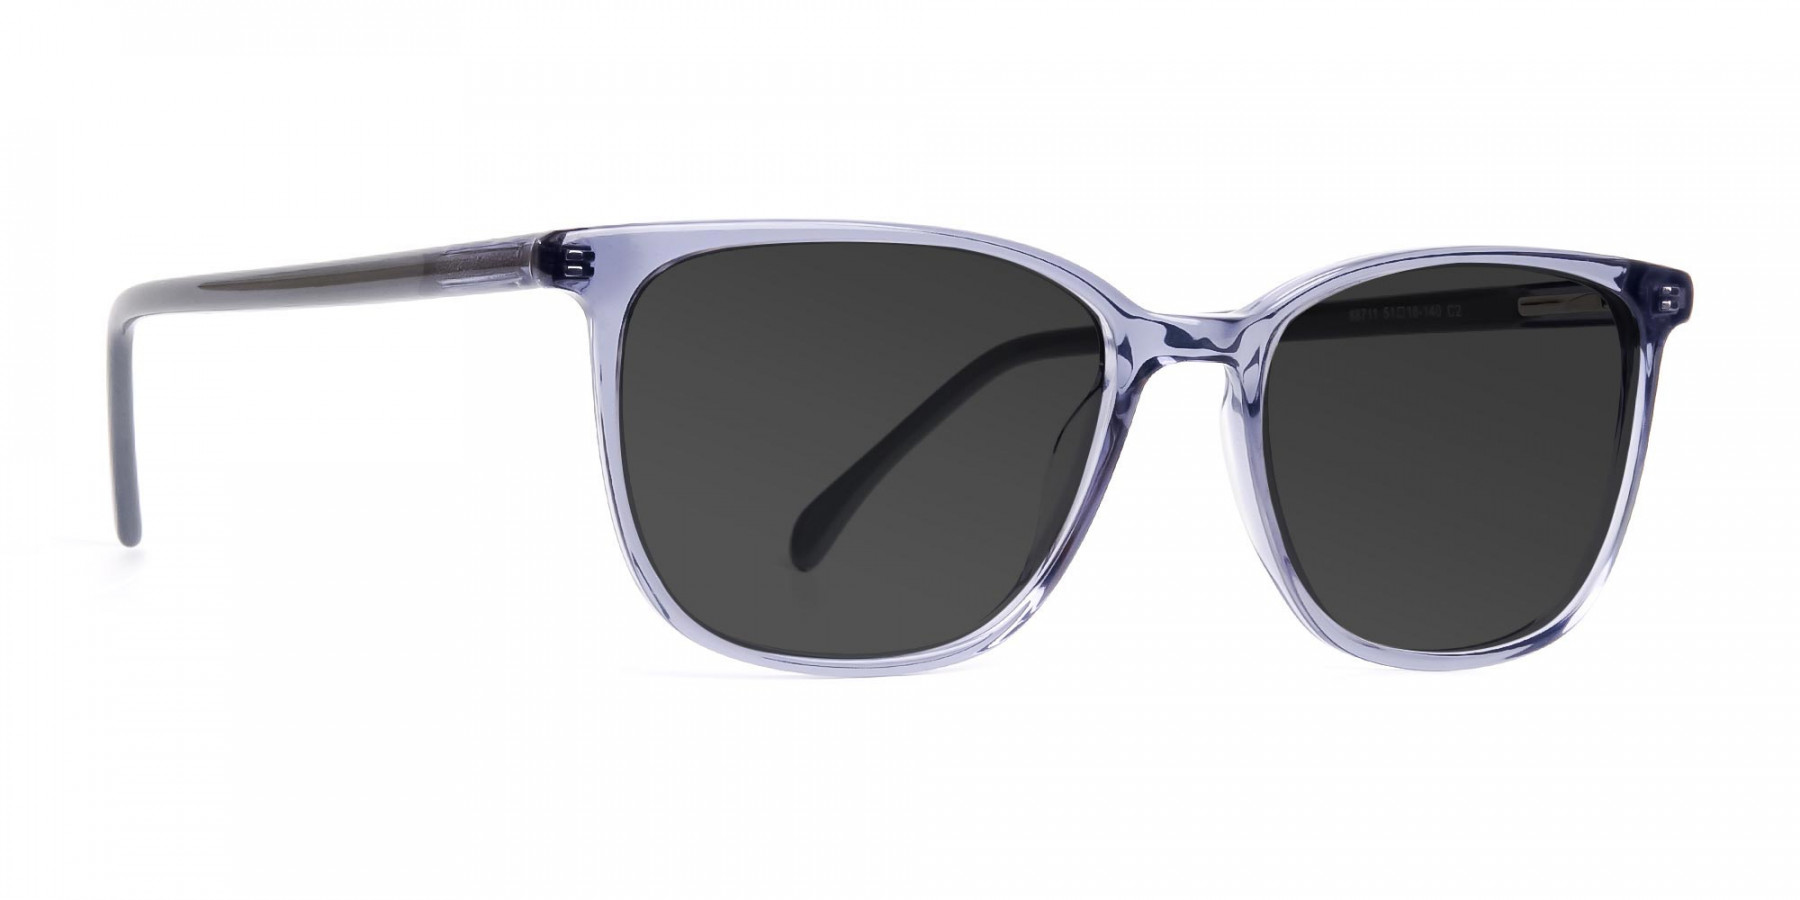 space-grey-wayfarer-and-rectangular-brown-tinted-sunglasses-frames-3